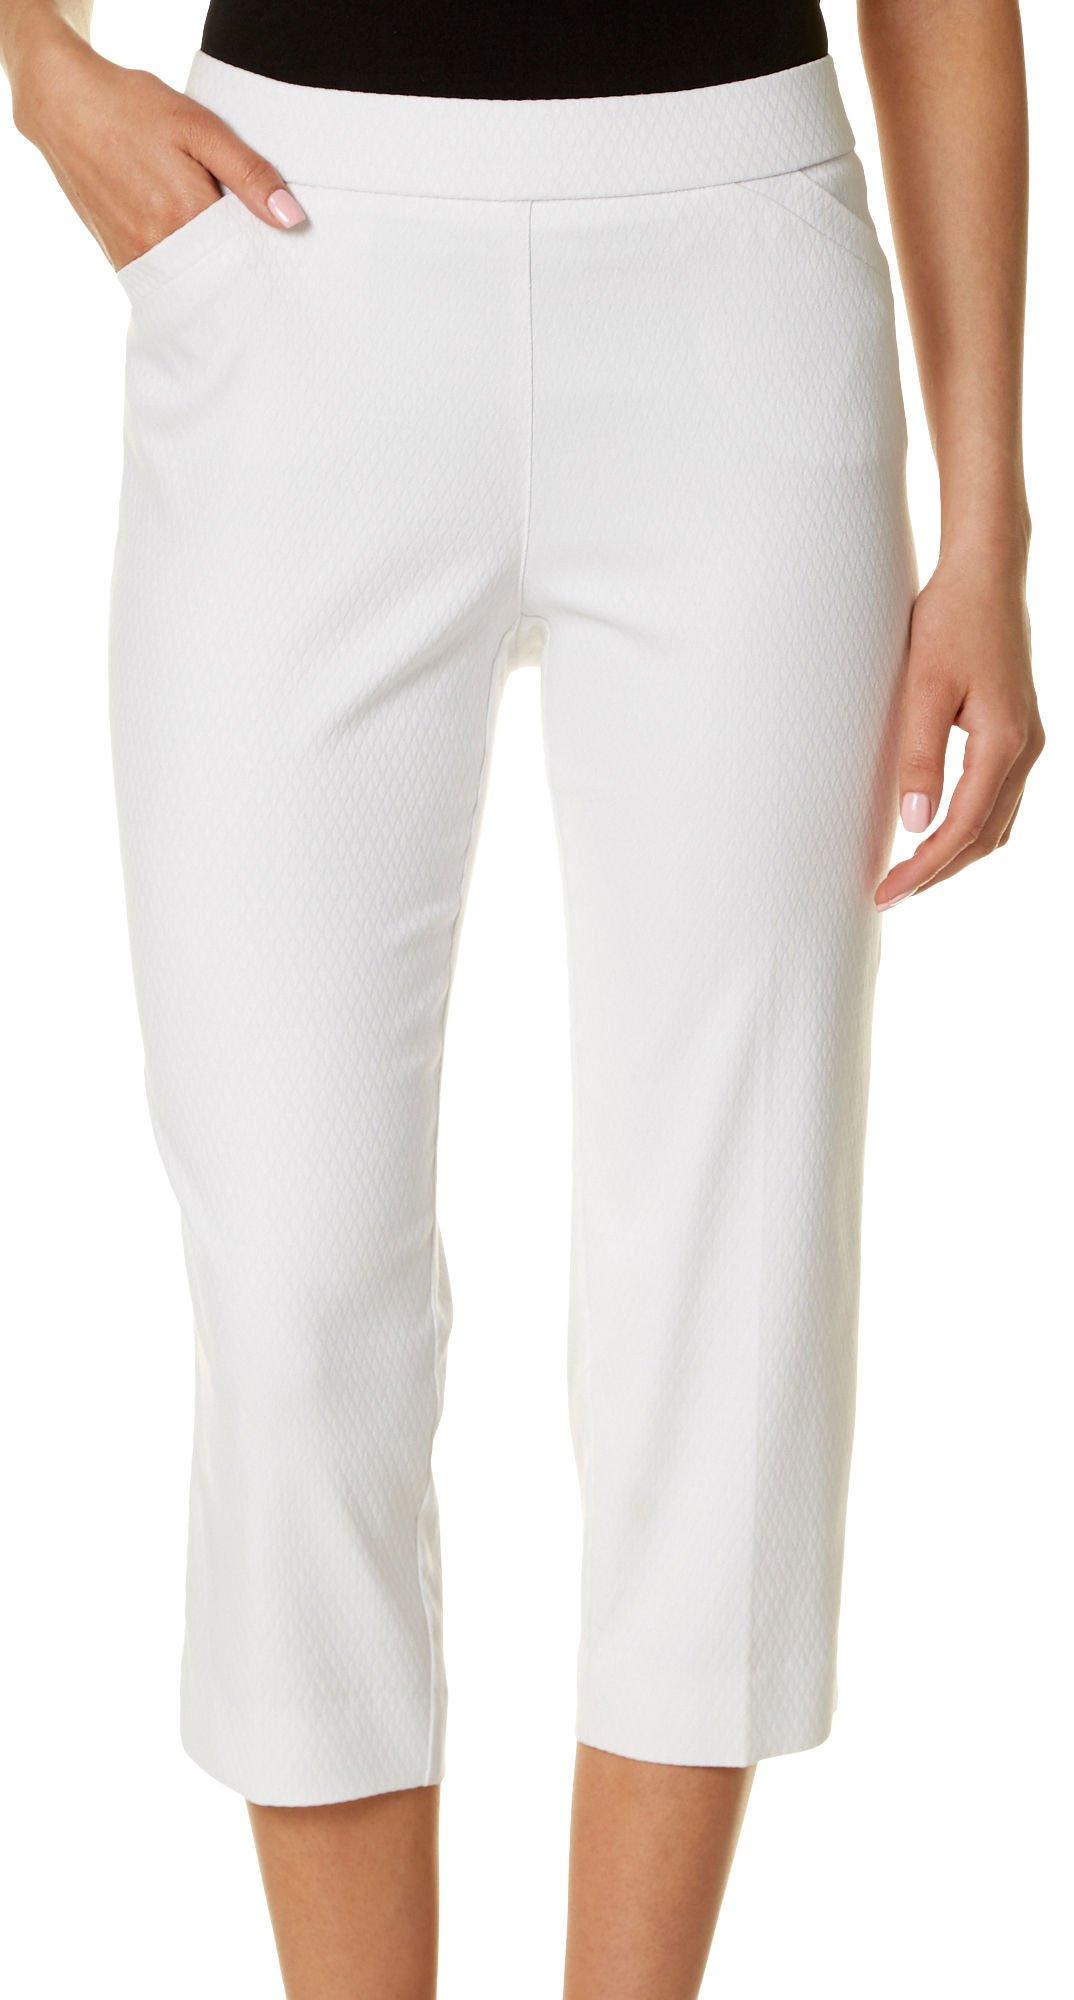 Counterparts Petite Diamond Textured Pull-On Capris 8P White